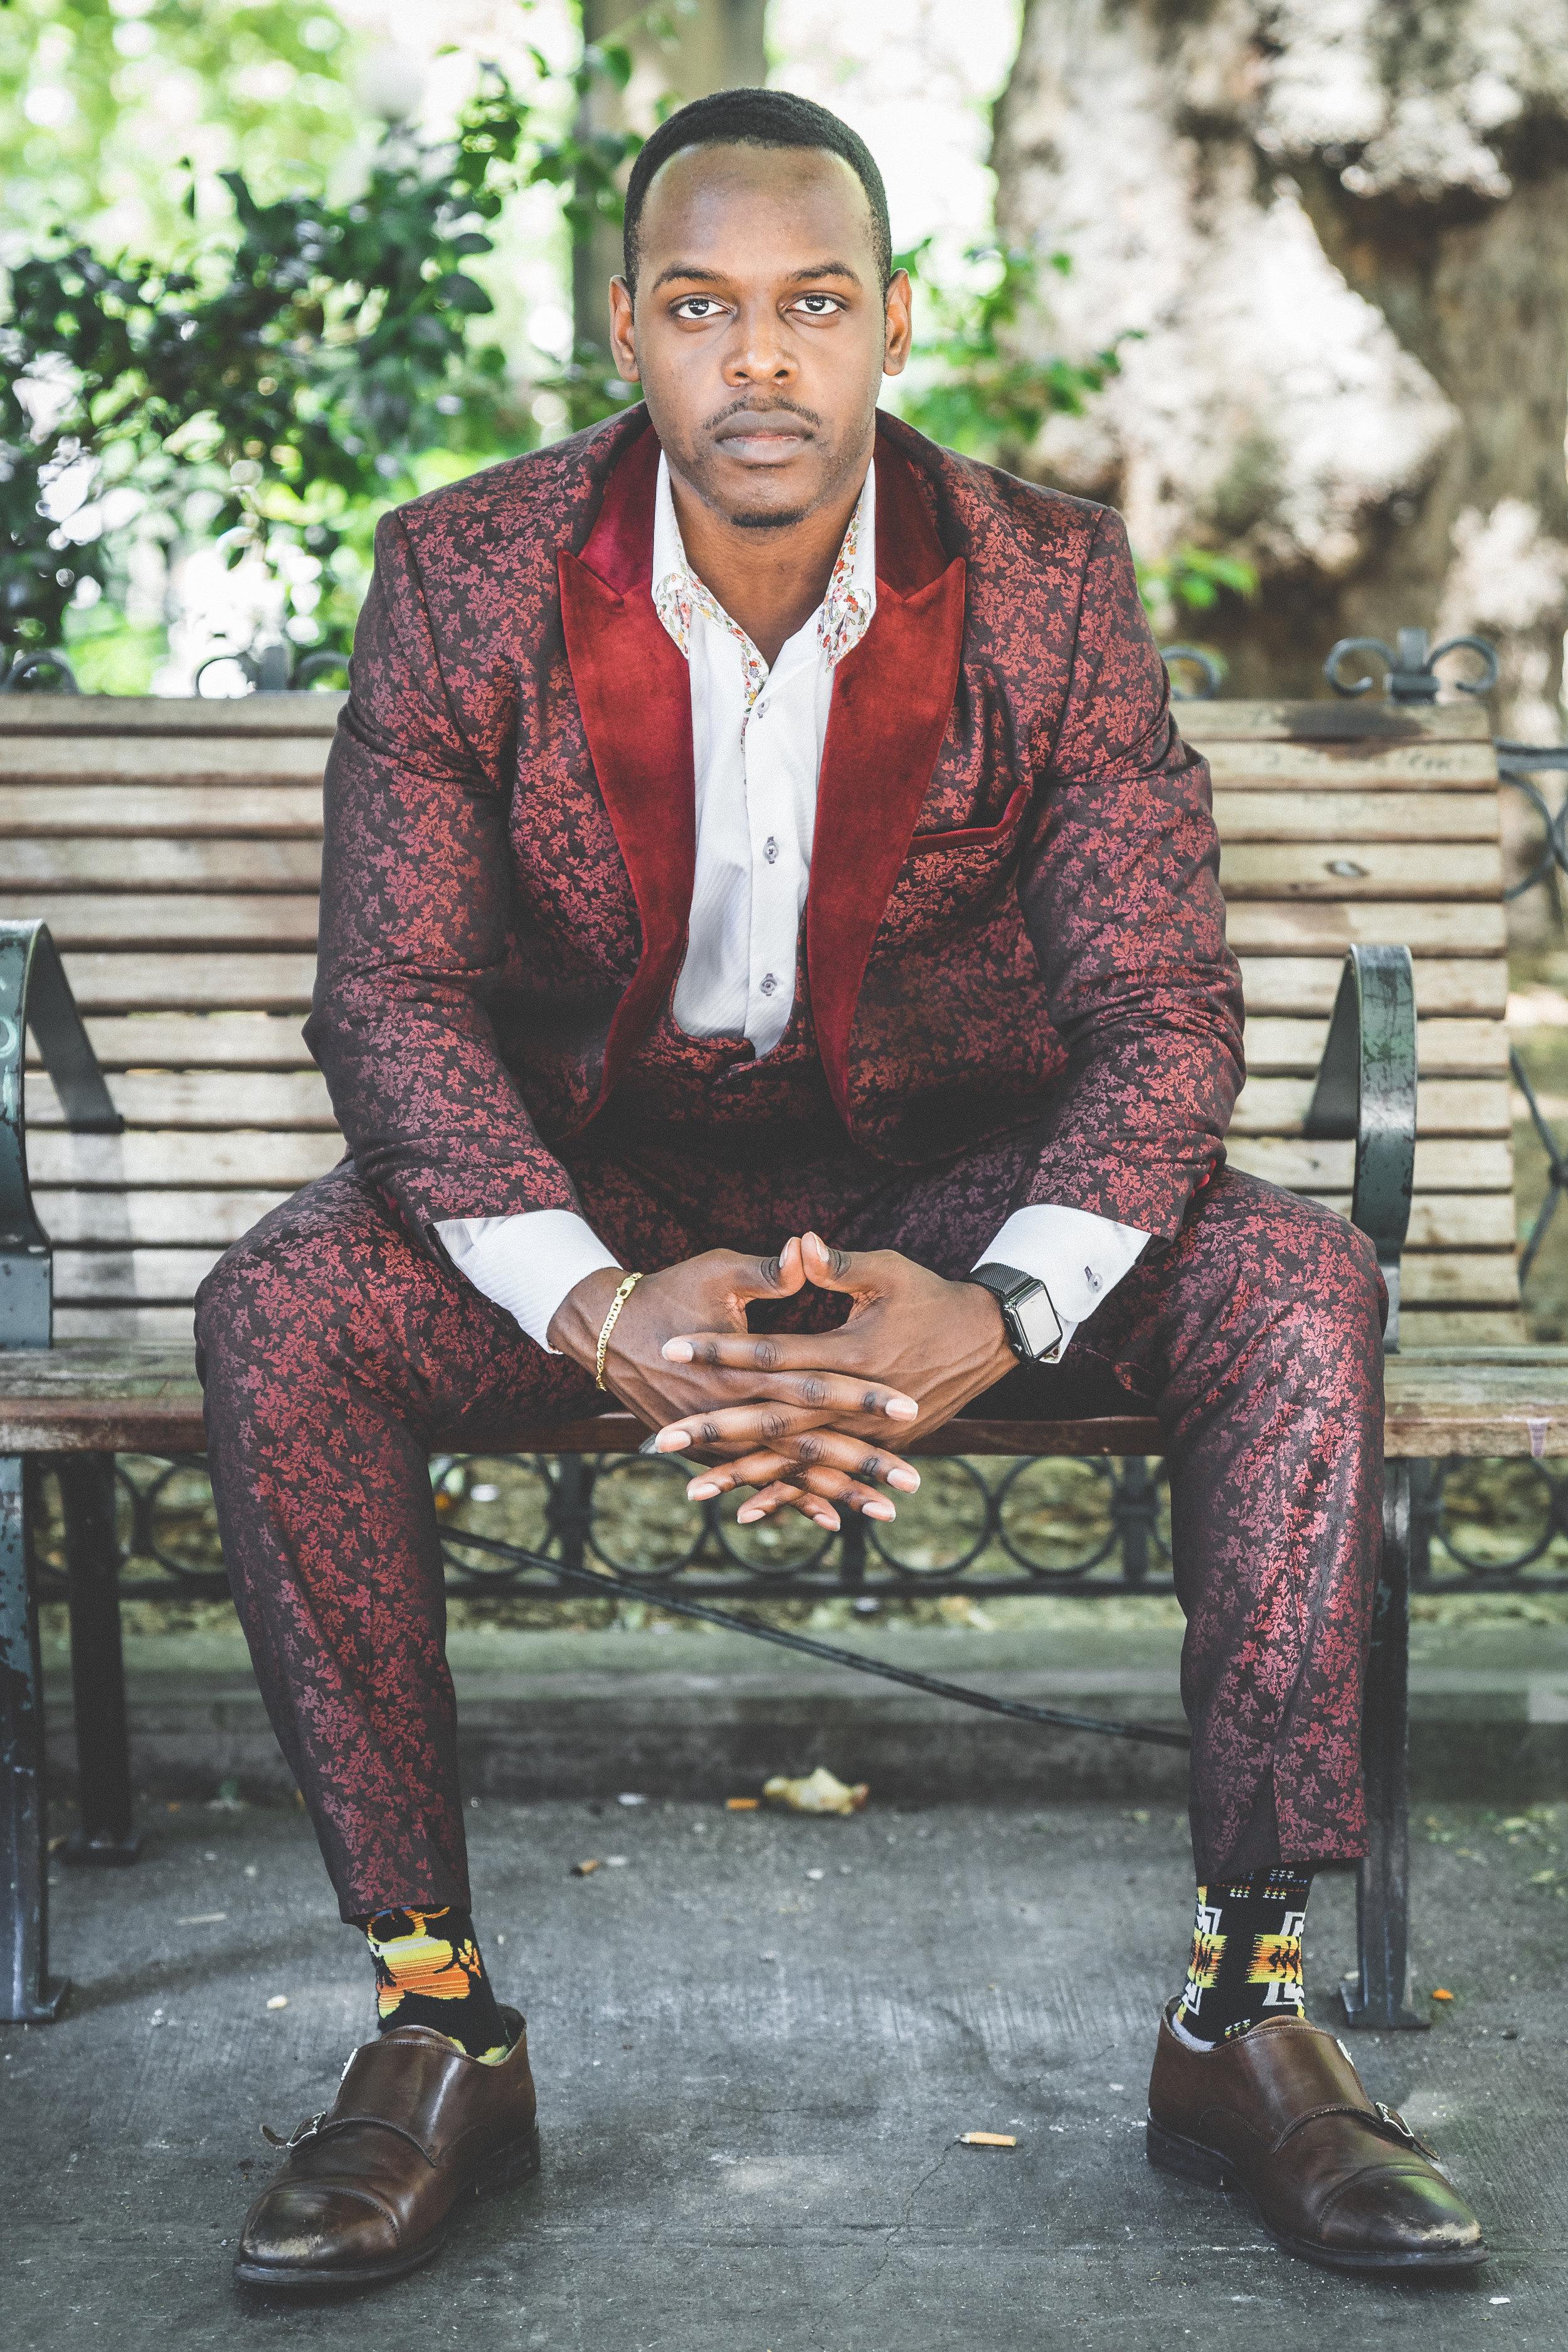 3-Piece suit ($140), dress shirt ($37)